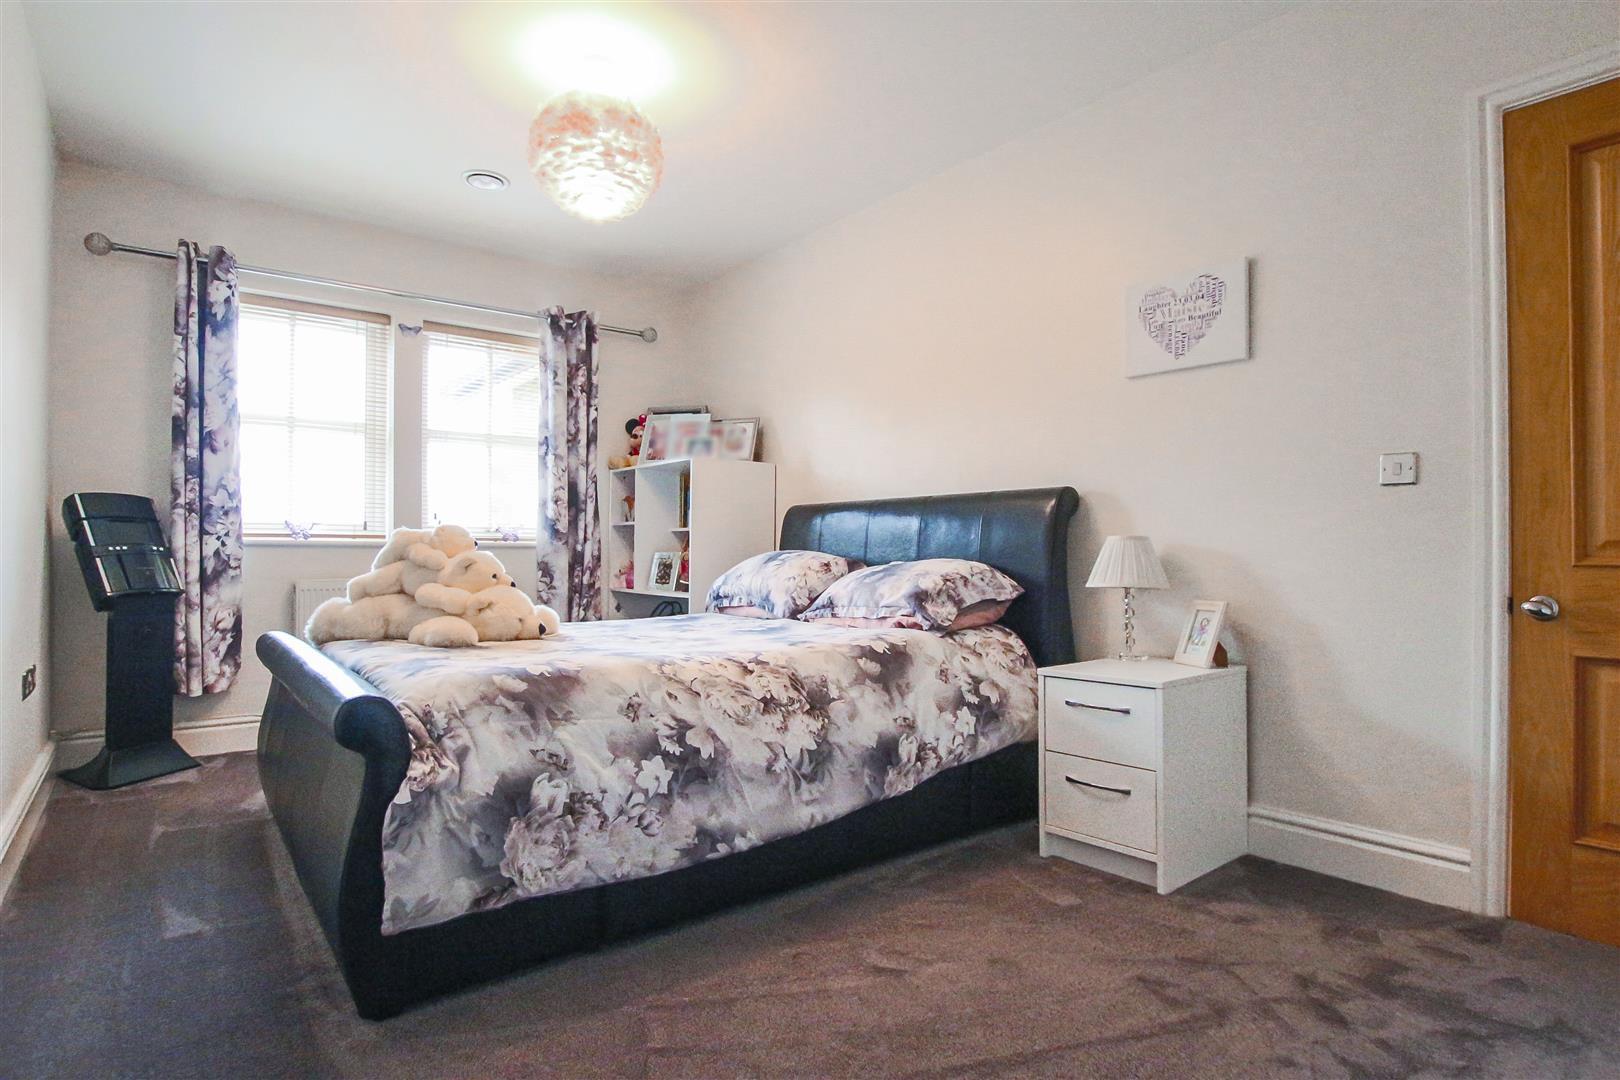 4 Bedroom Detached House For Sale - Bedroom 4